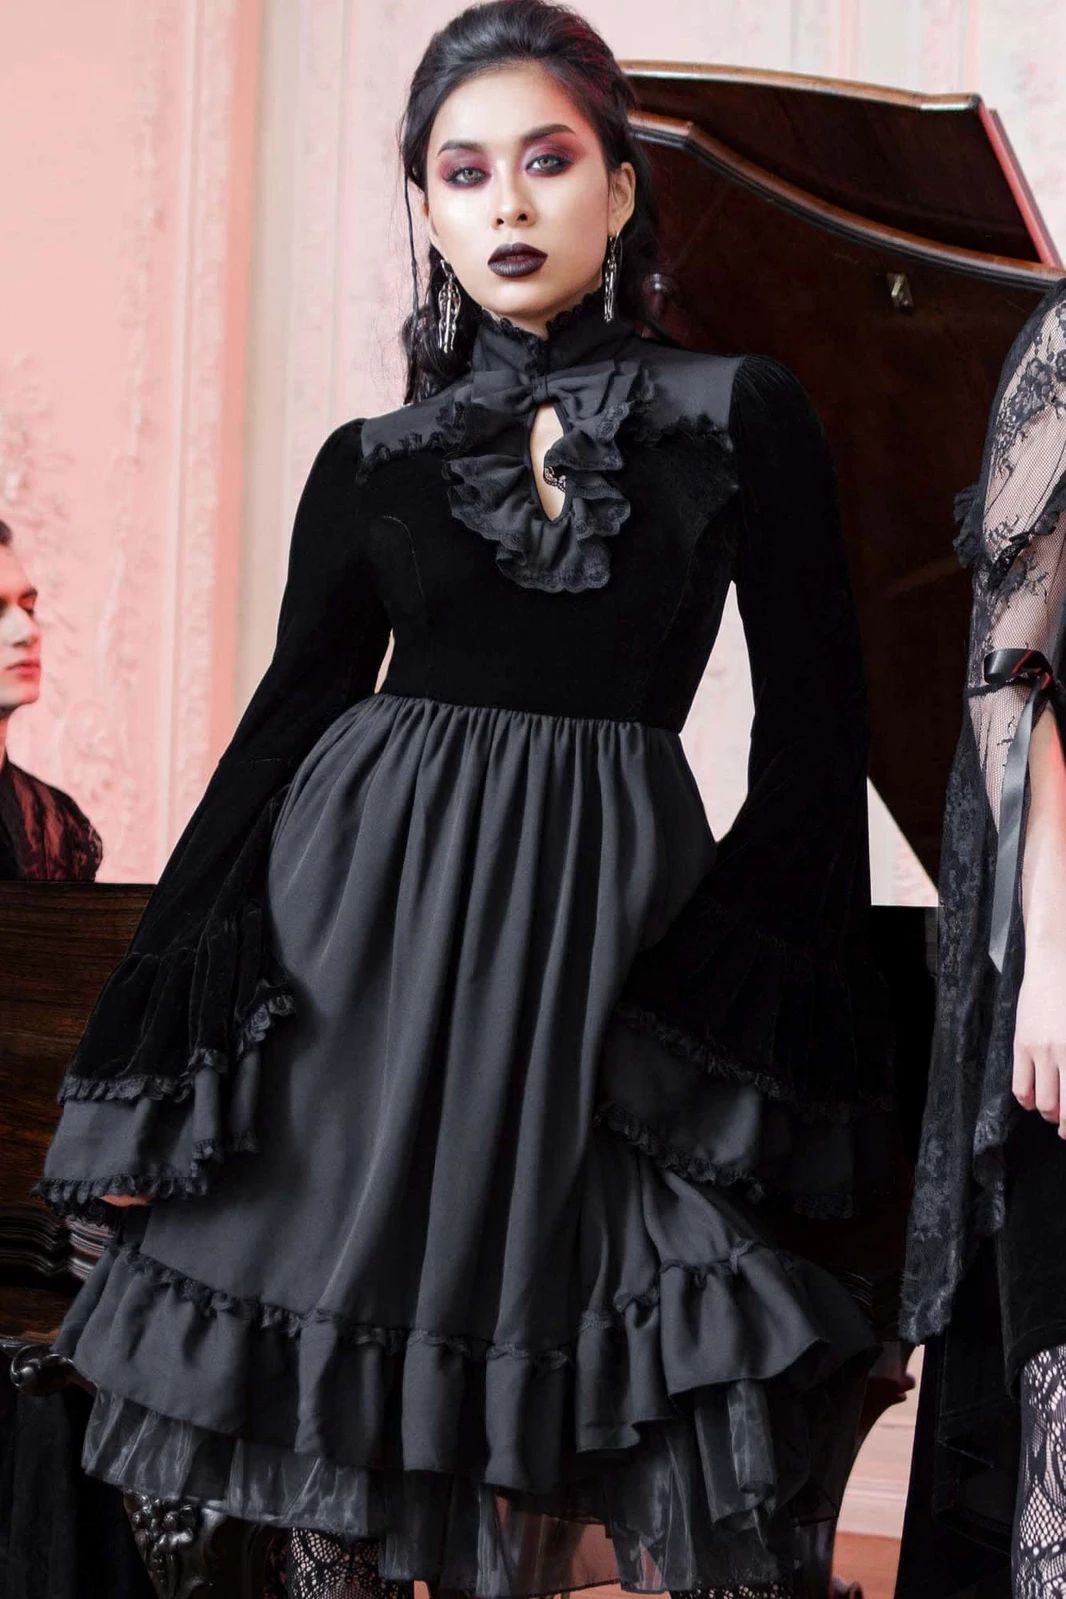 KS02968_mini-robe-gothique-glam-rock-killstar-lost-girl